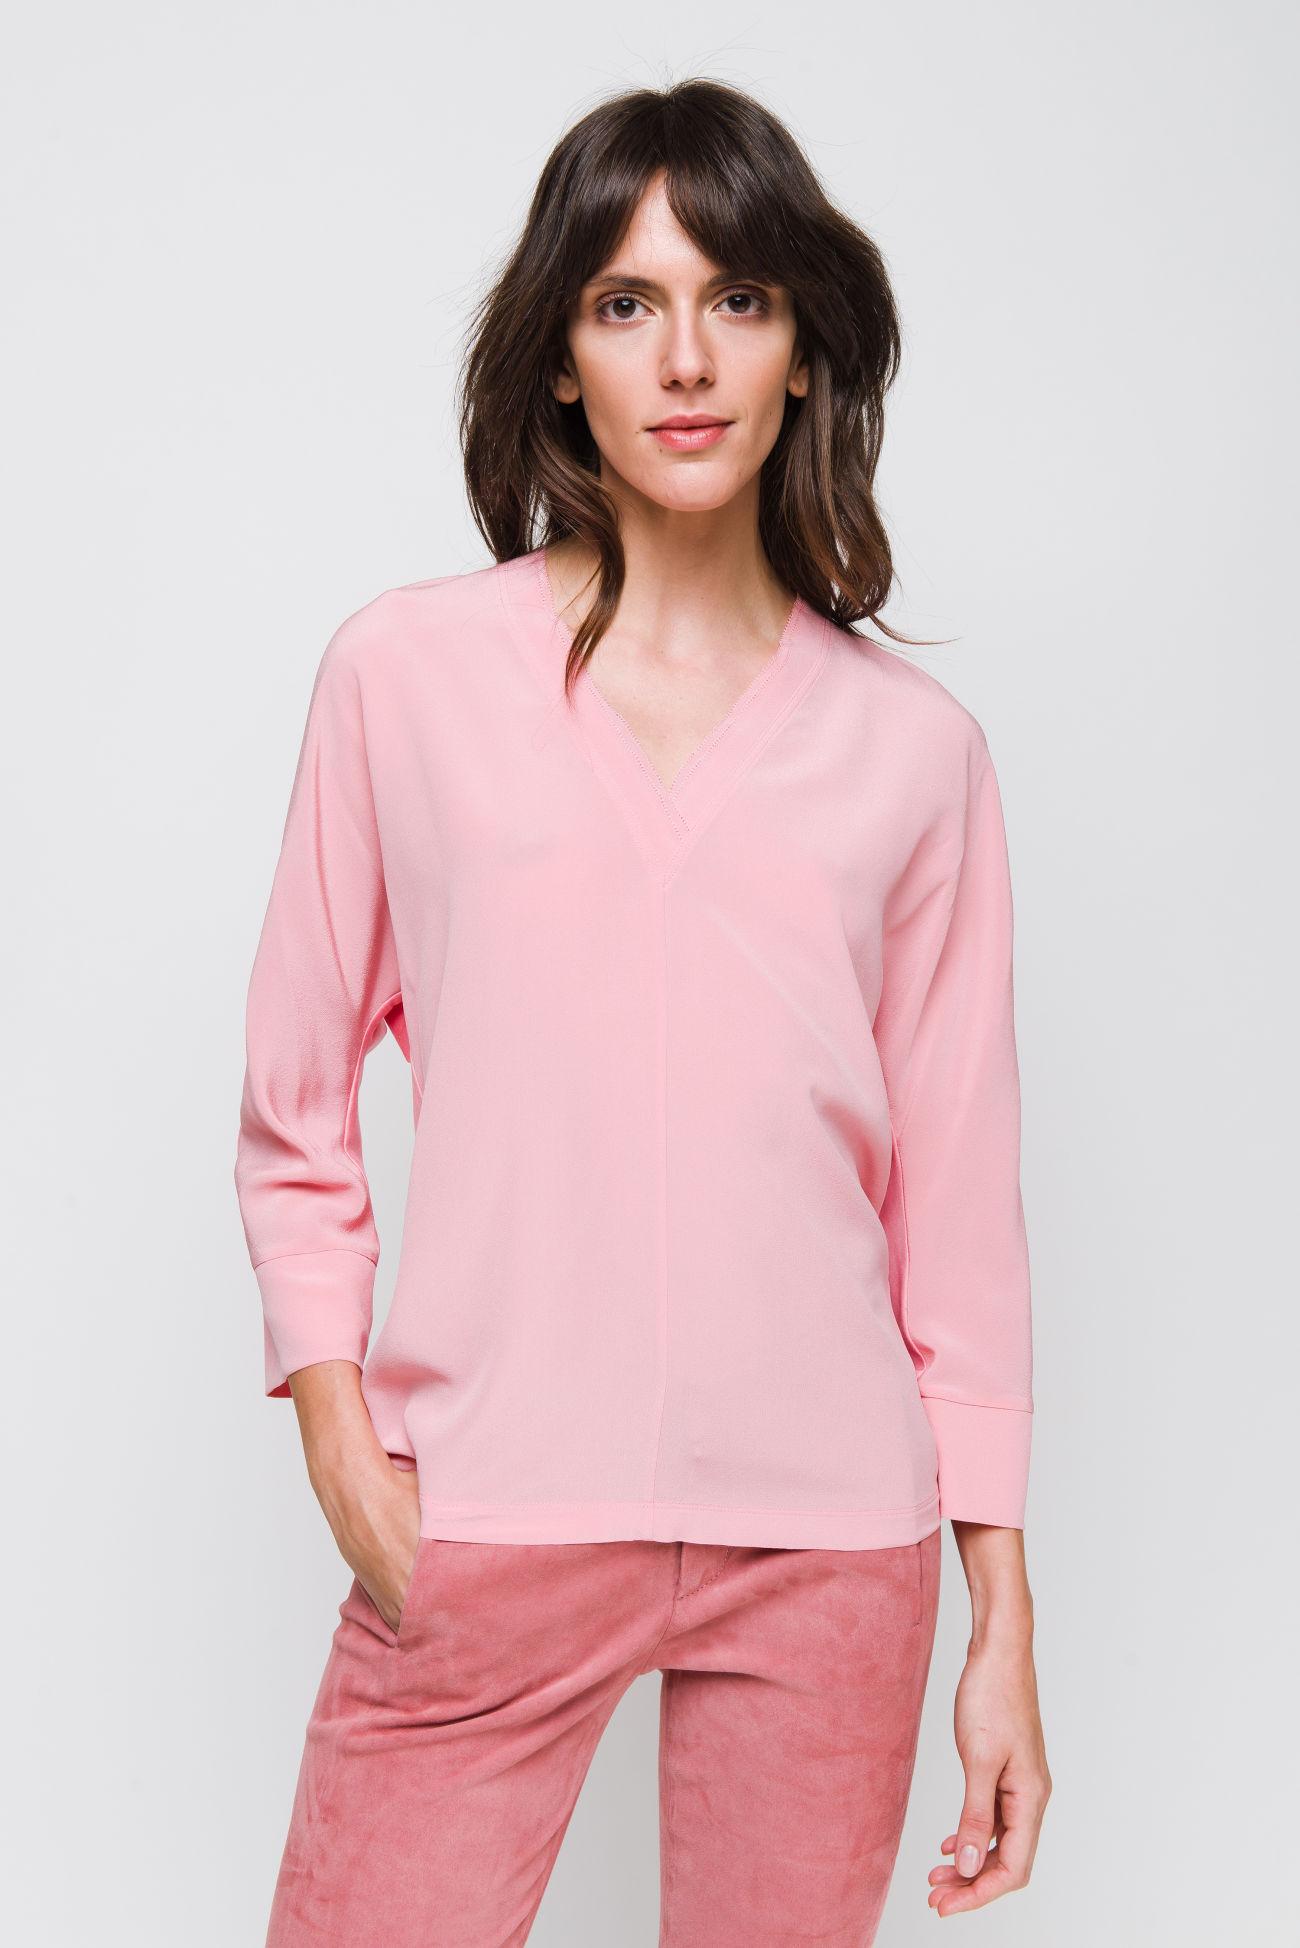 Blouse-shirt in silk crêpe